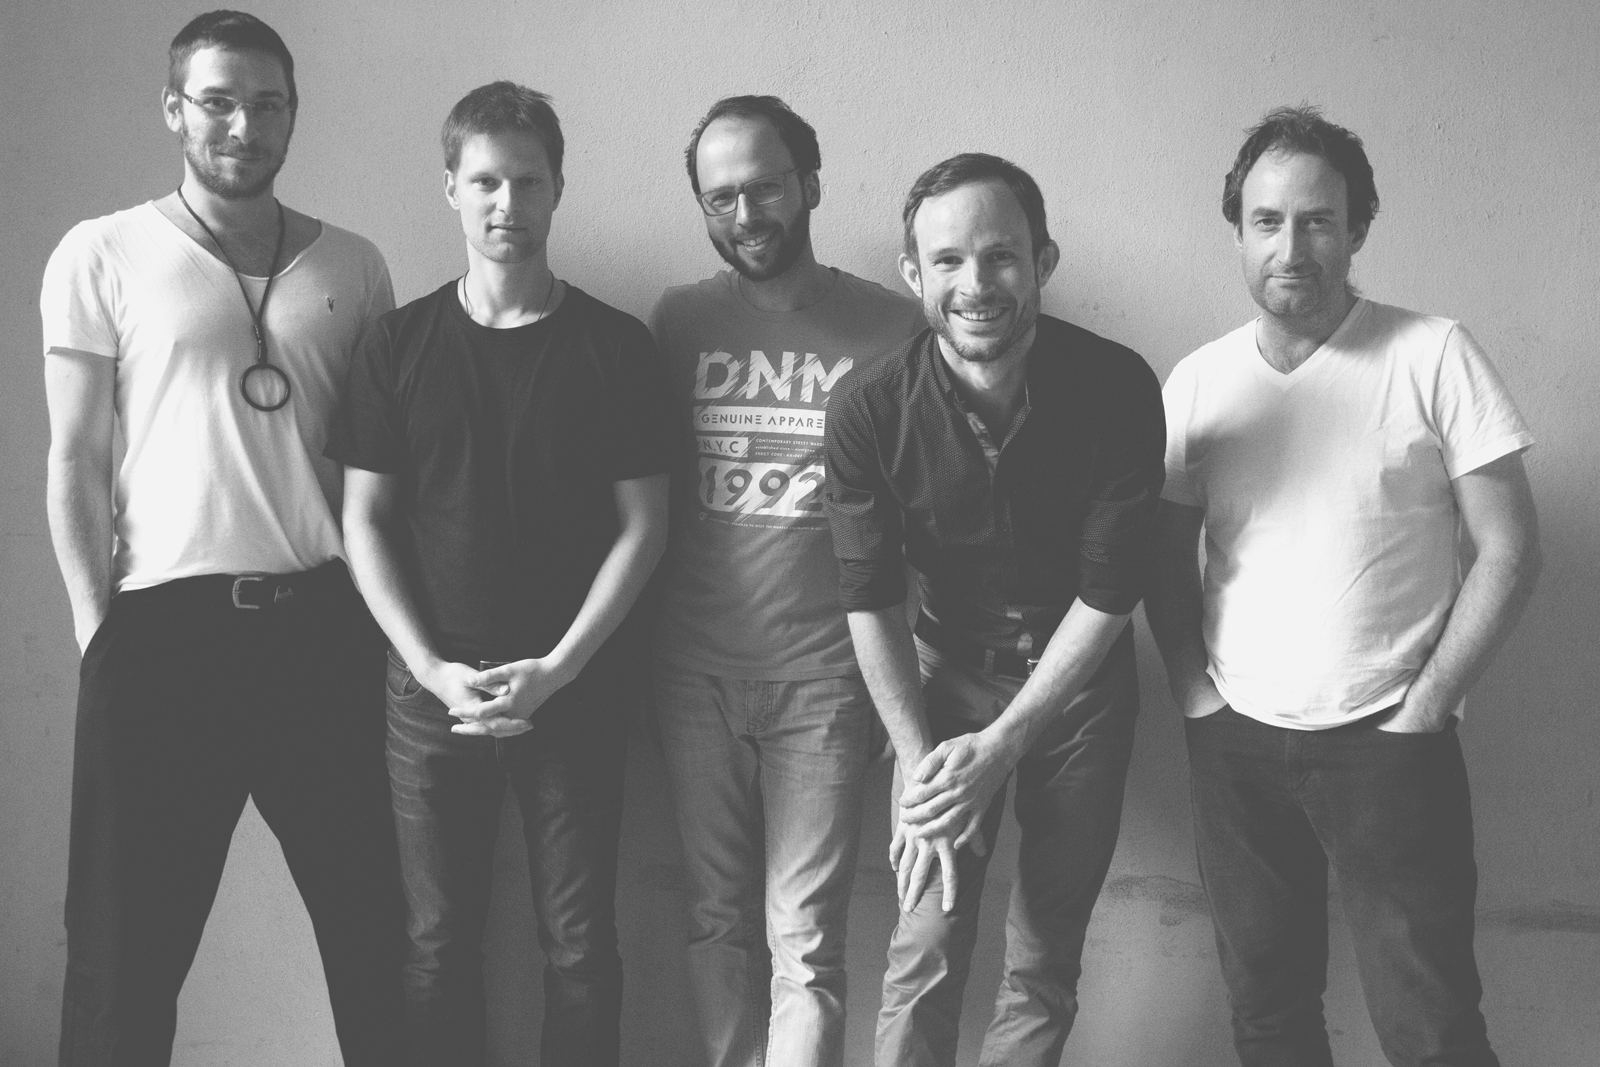 Points Rataj Quintet - Oskar Torok, Lubos Soukup, Tomas Liska, Tomas Hobzek, Michal Rataj Photo by Barka Fabianova